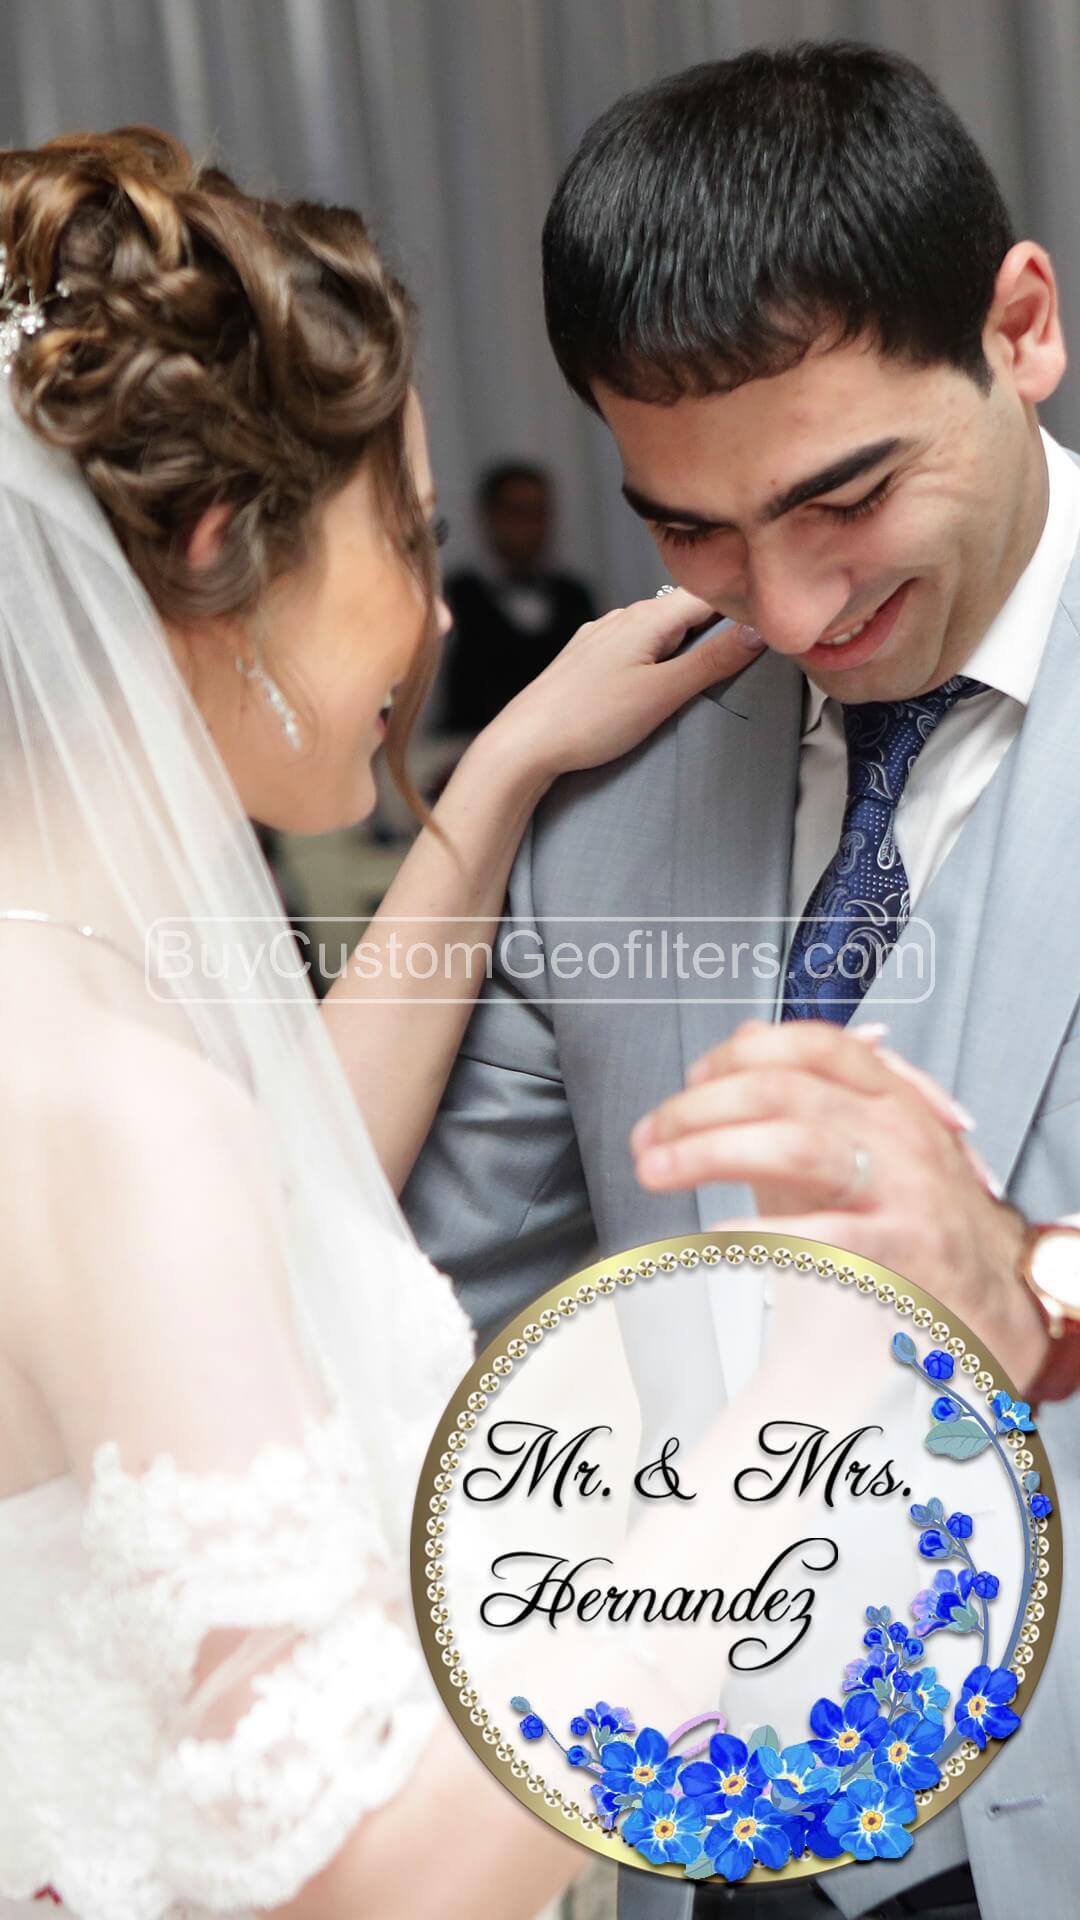 snapchat-wedding-geofilters-for-hernandez-wedding.png